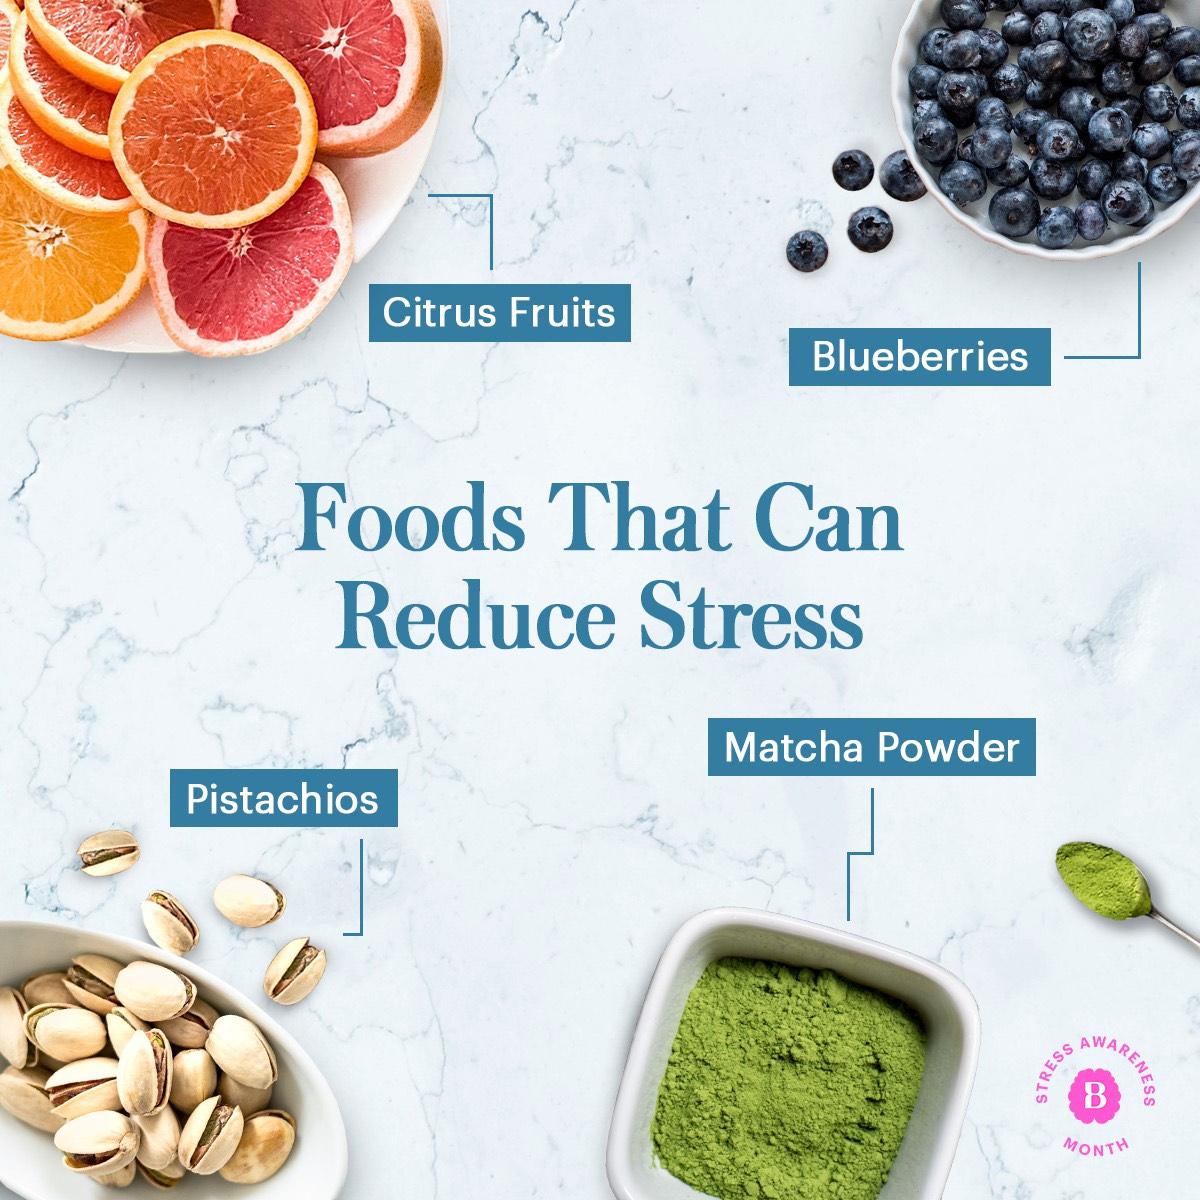 FoodsReduceStress-squashed